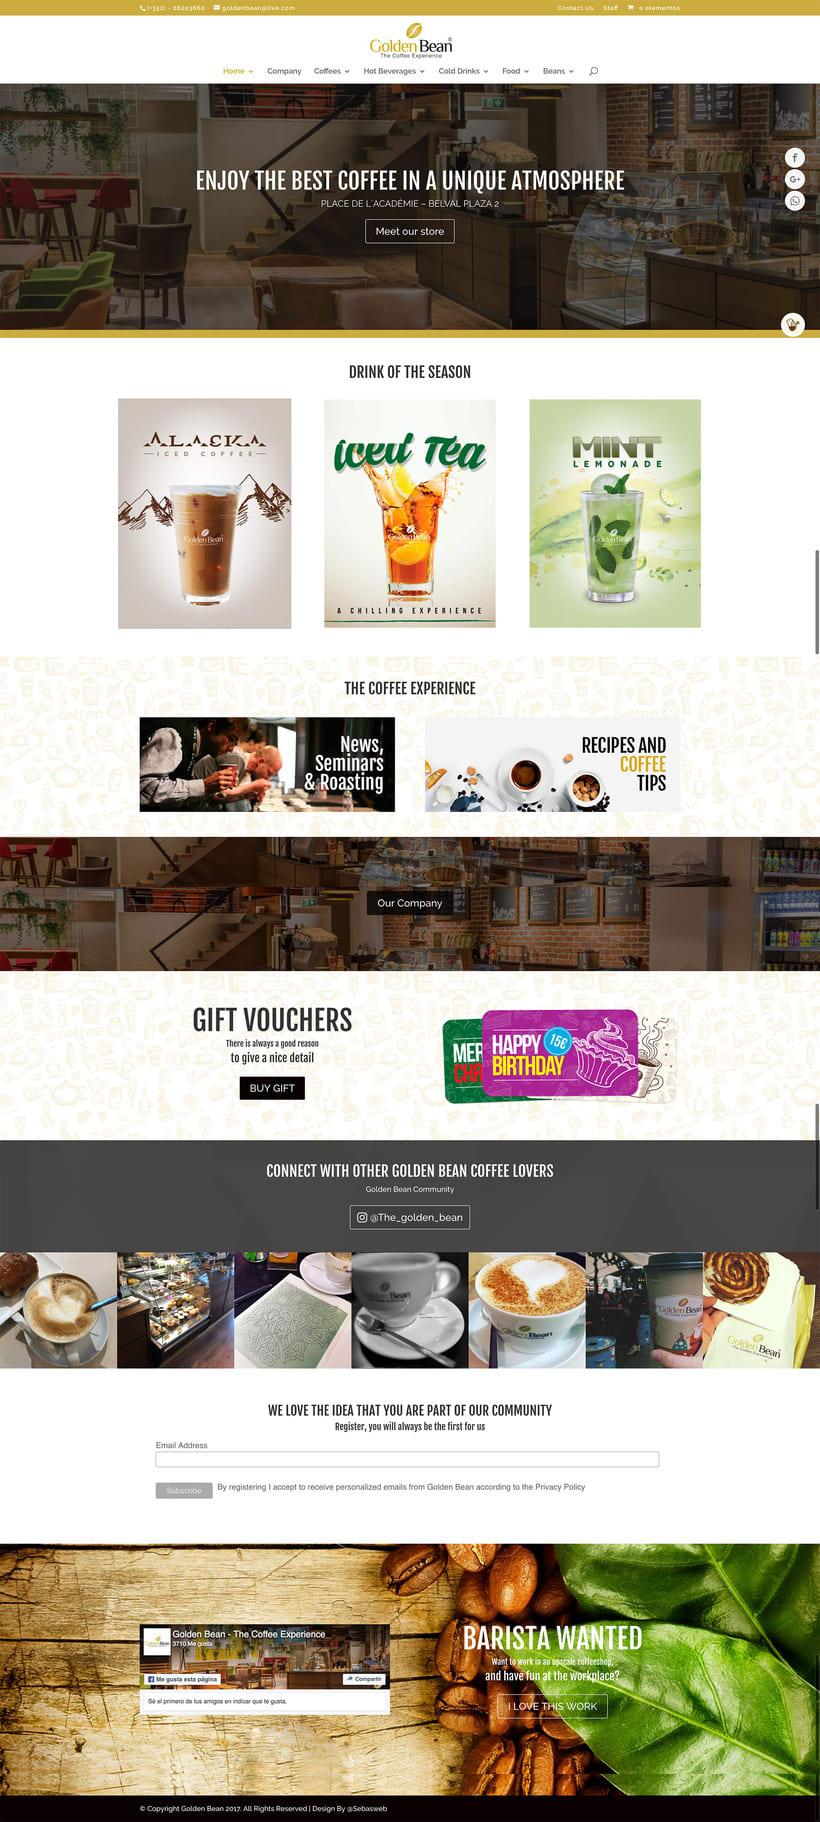 Cliente: Golden Bean - Diseño y Montaje en Wordpress - Luxemburgo 0